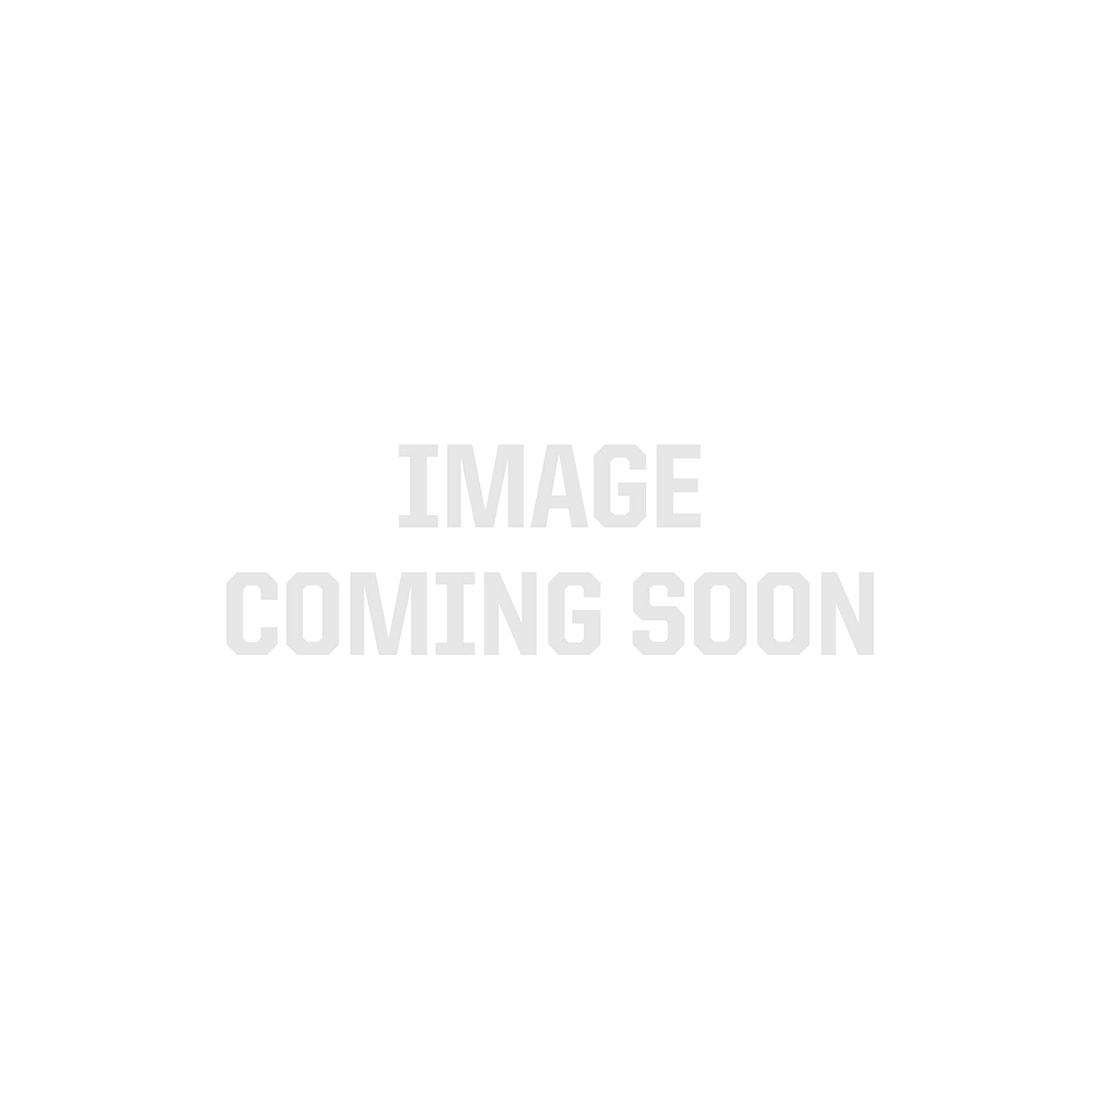 Red 2835 CurrentControl Bendable ZigZag LED Strip Light, 60/m, 8mm wide, Sample Kit